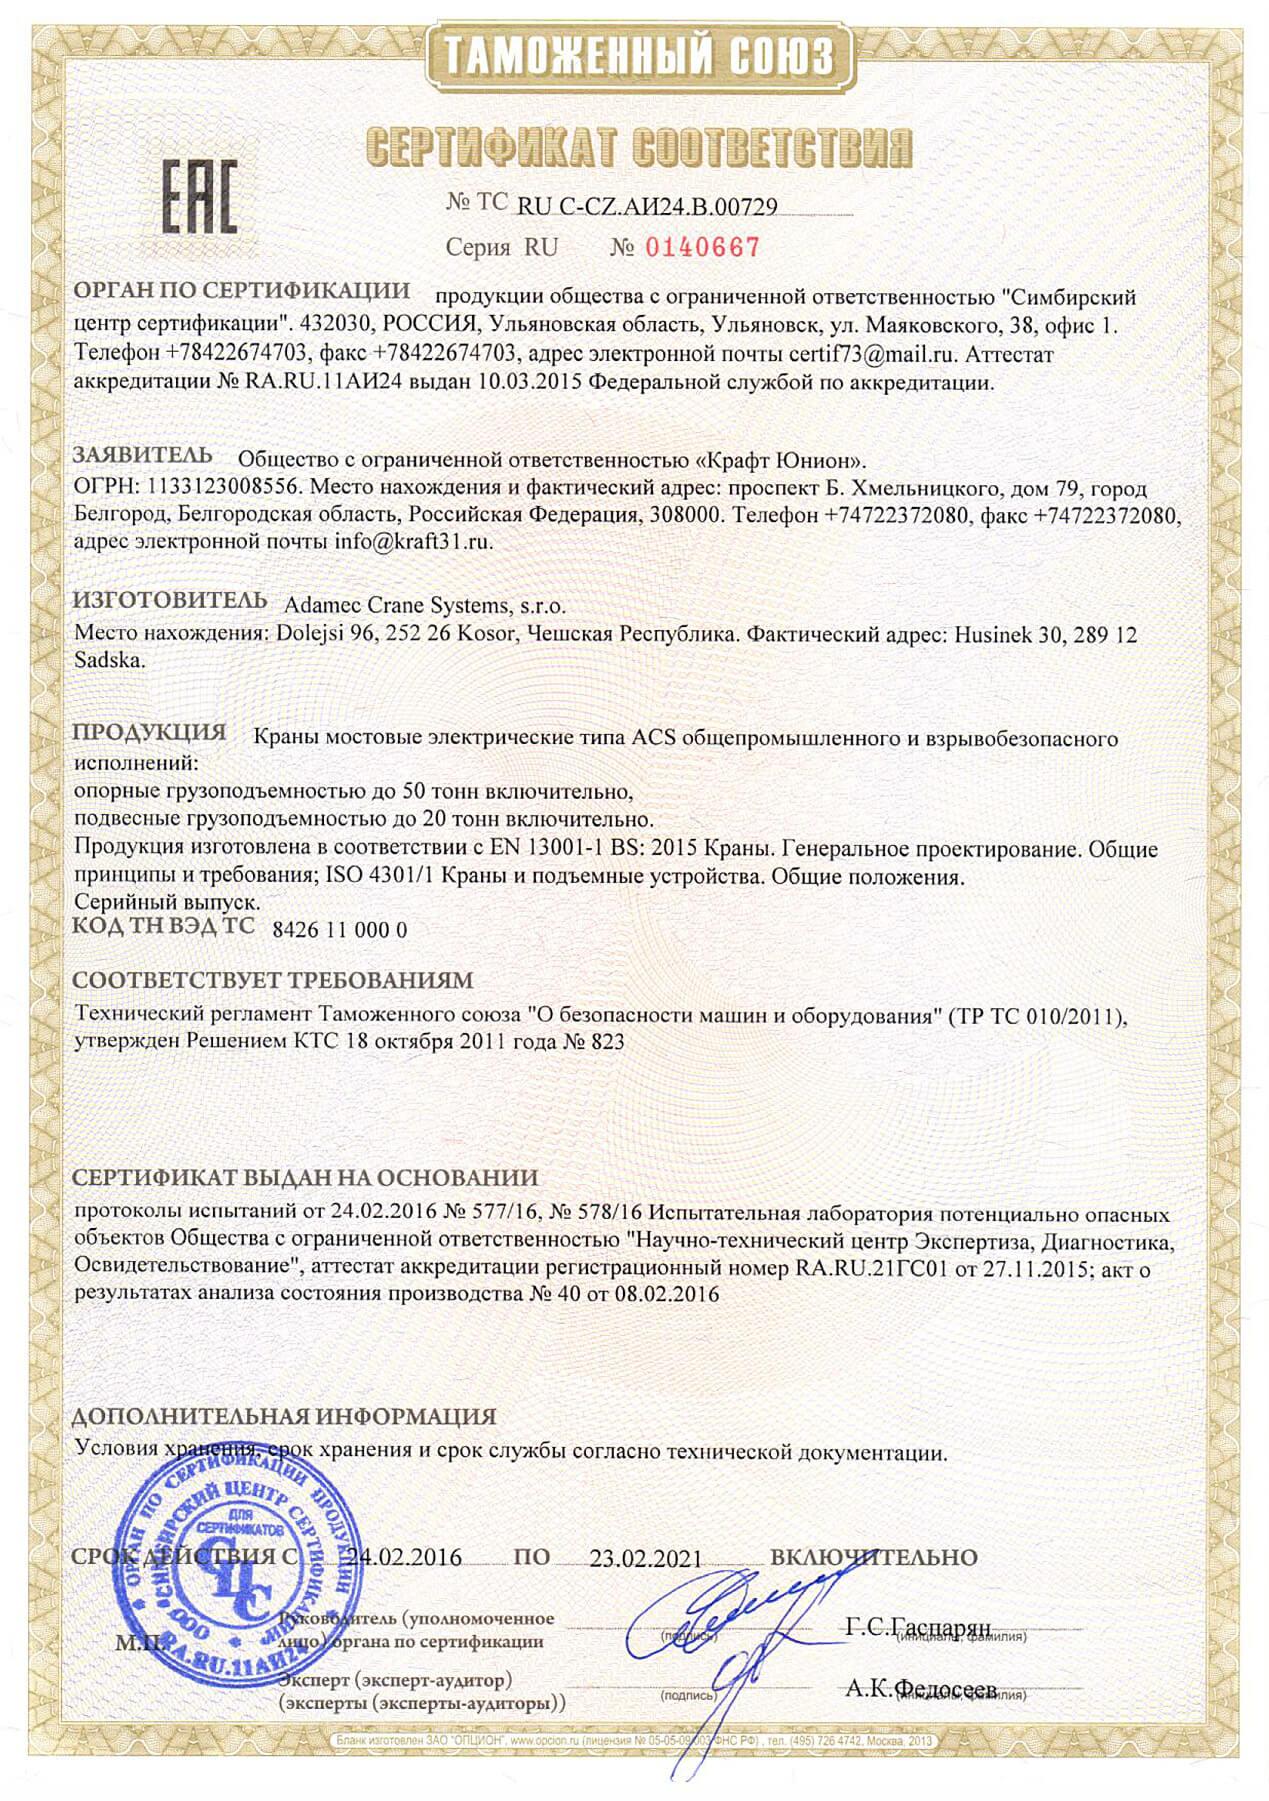 Certifikat Sootvetstvija